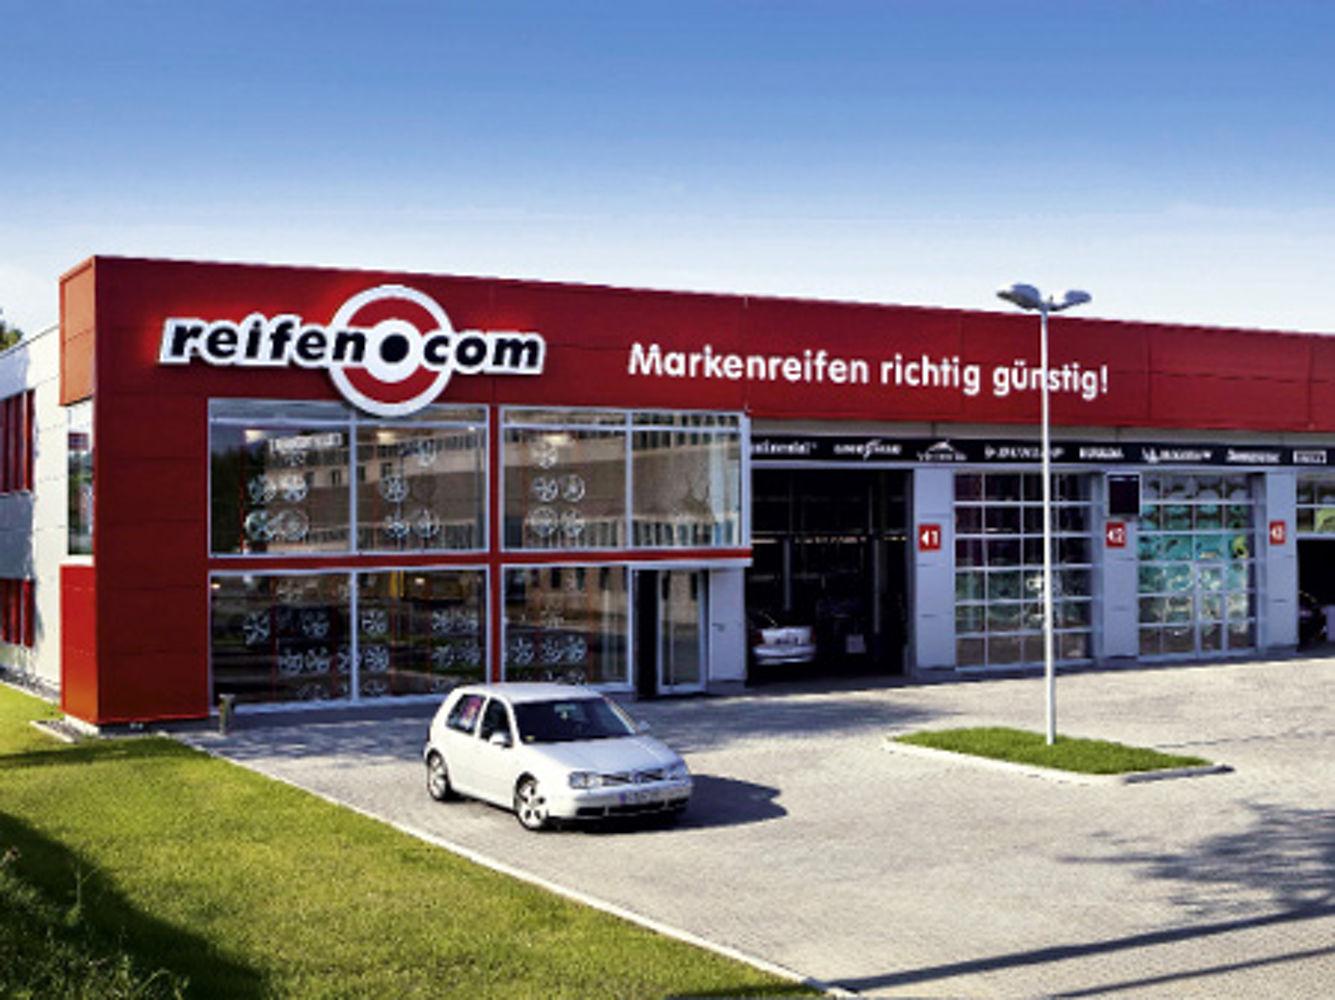 reifen.com-branch in Aachen